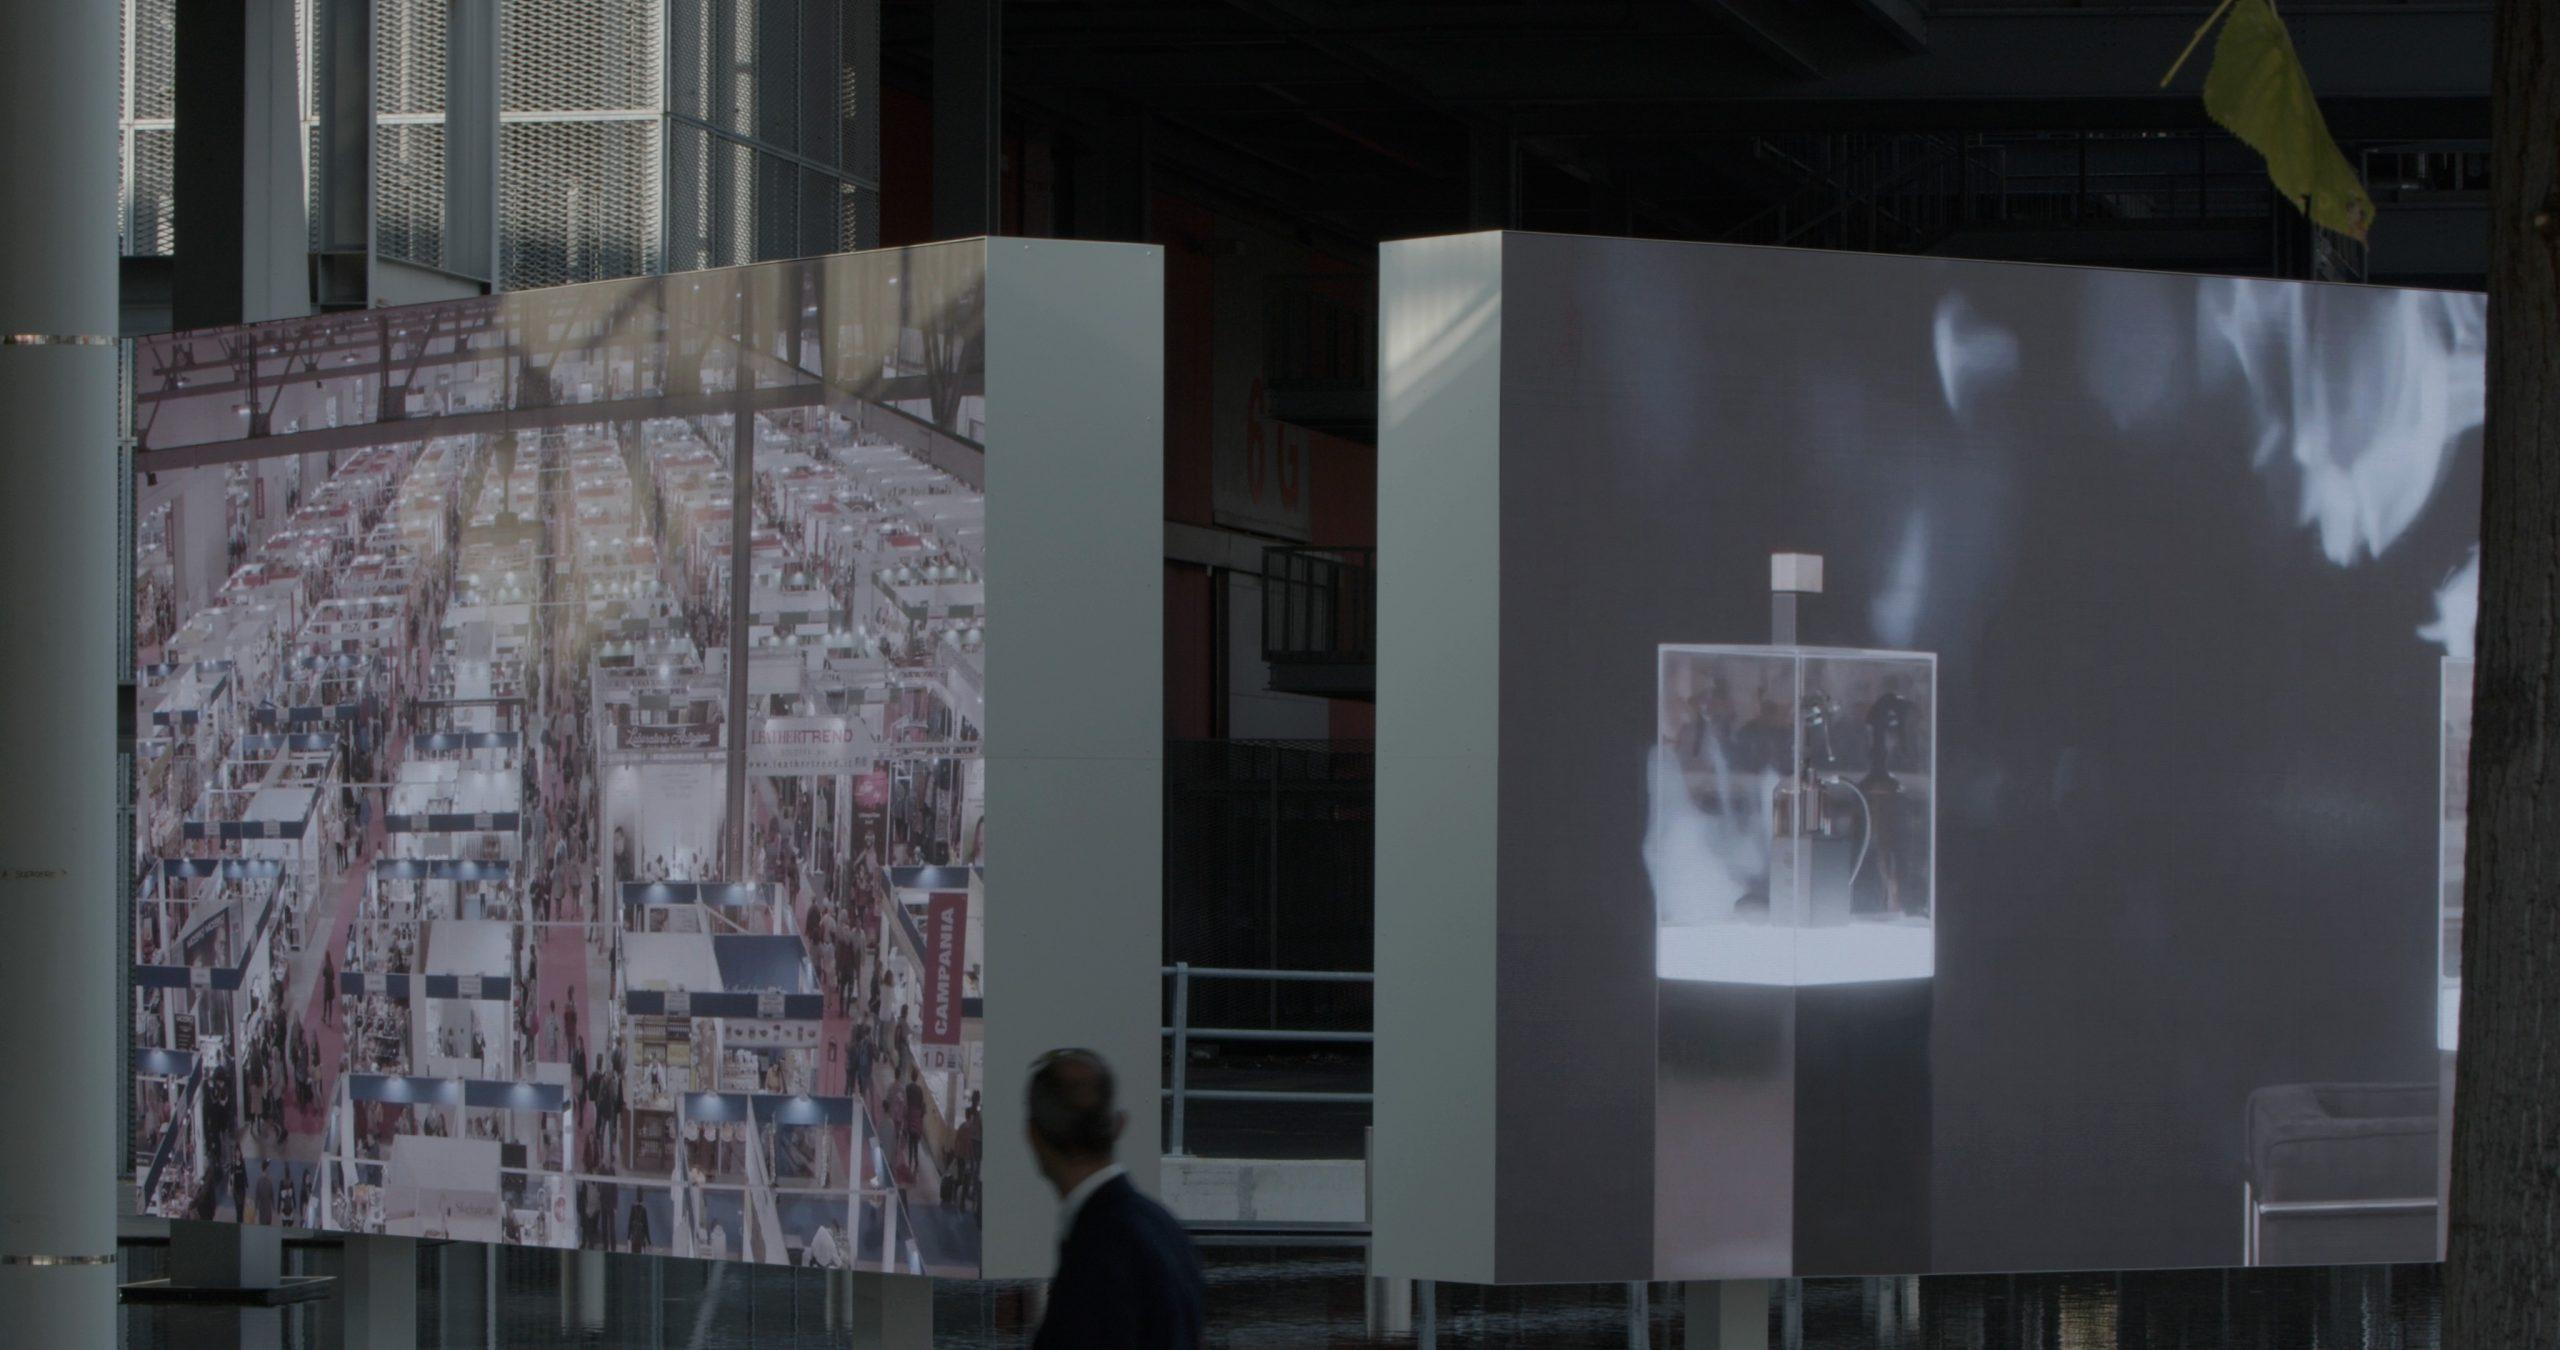 Fiera Milano Rho Mico Portello Leftloft documentario culturale